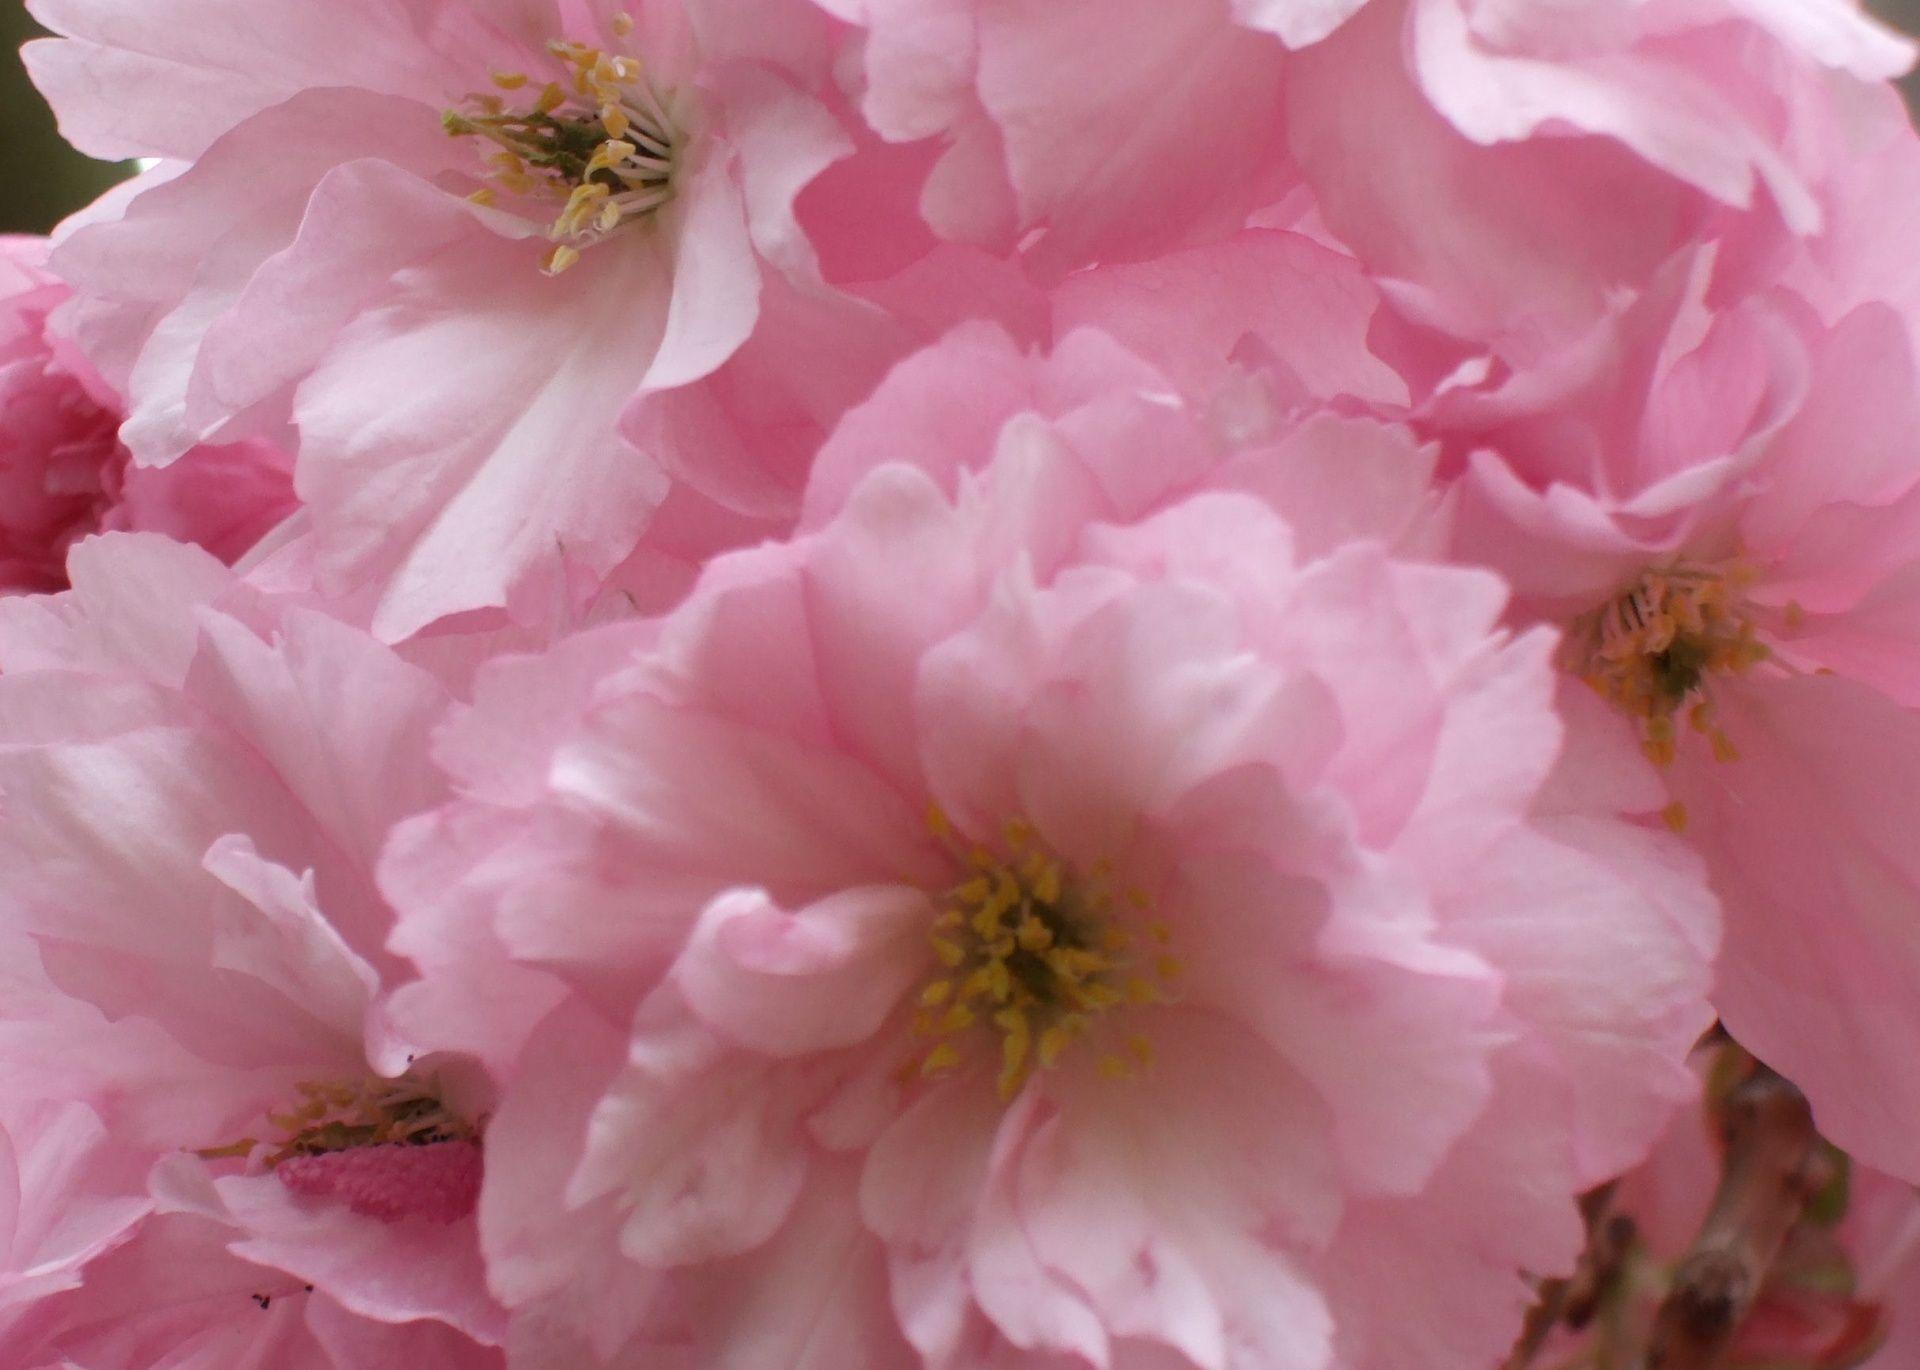 Spring flowers background pink spring flower 1920 x 1370 spring flowers background pink spring flower 1920 x 1370 download close mightylinksfo Gallery